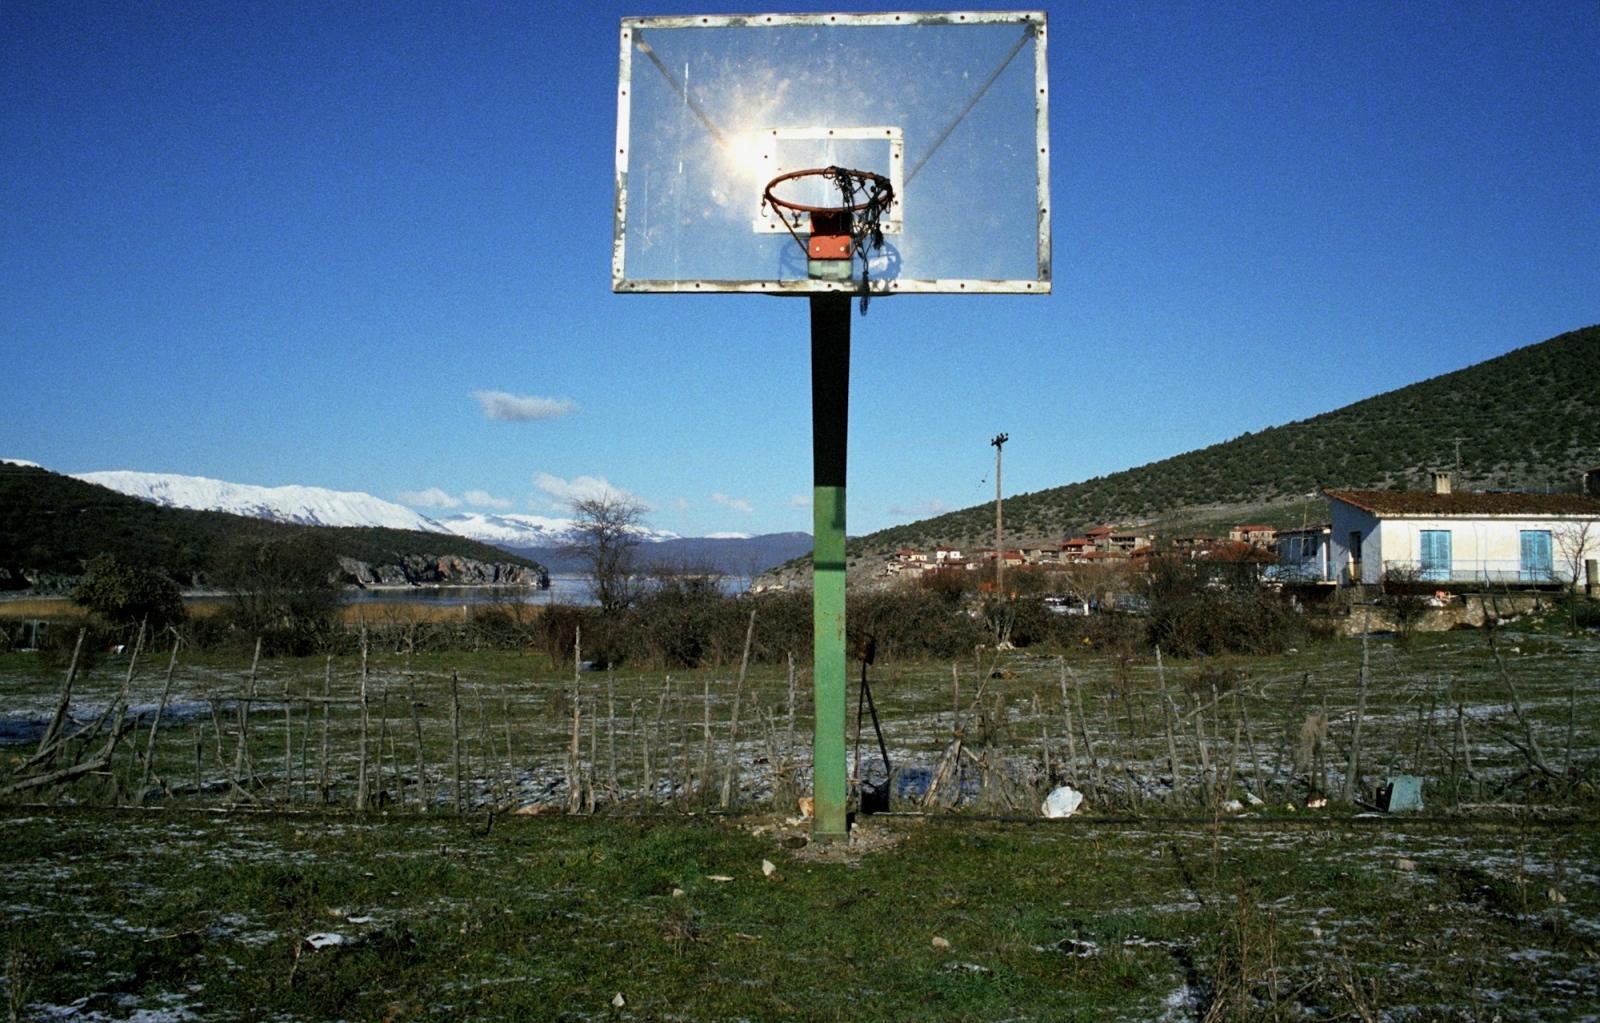 Village basketball court. Near the Albanian border, northern Greece.